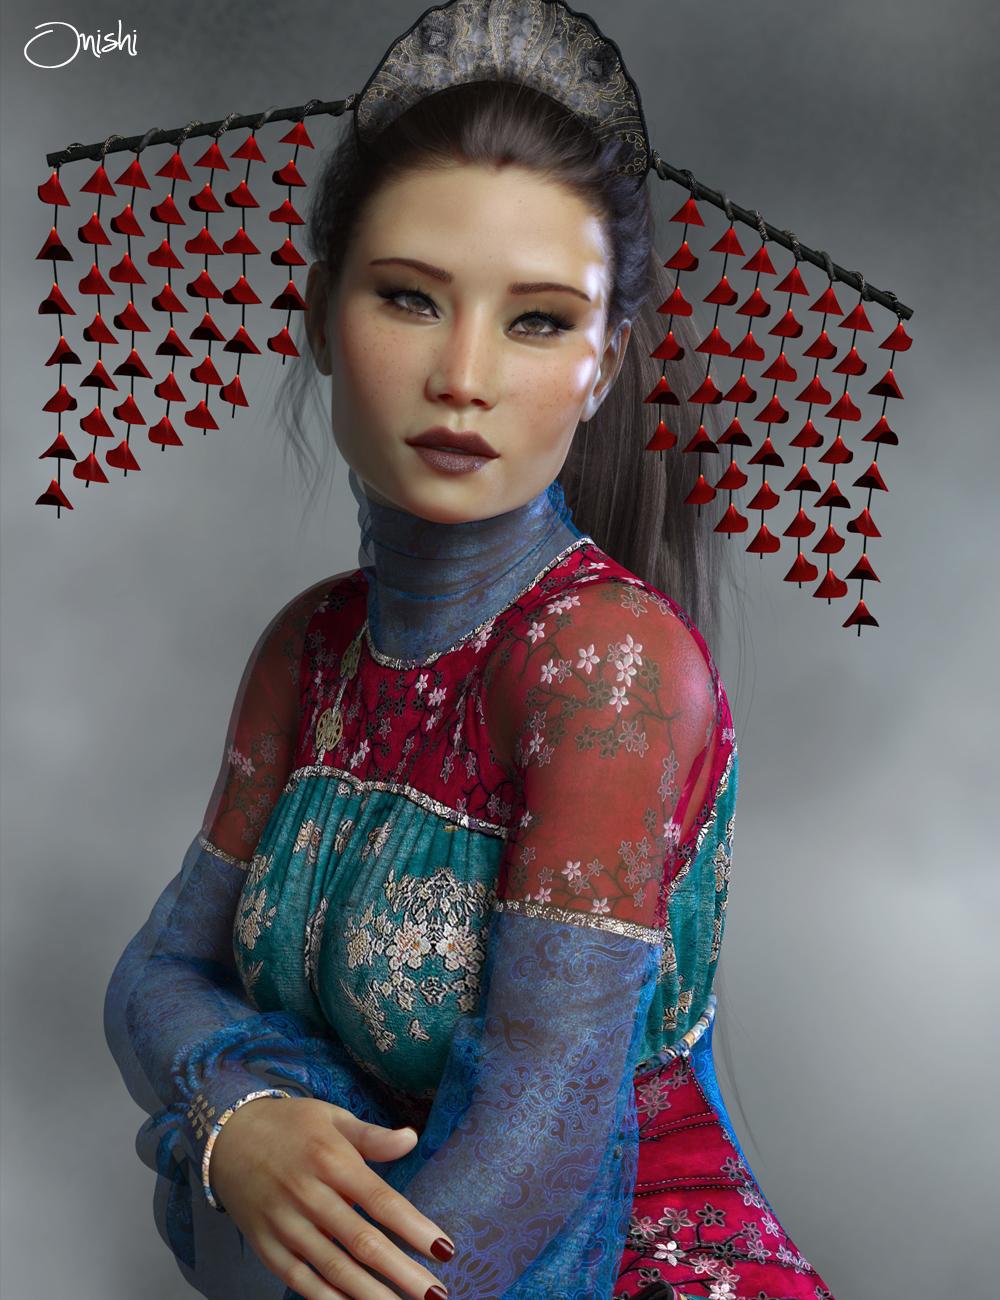 PS Onishi for Genesis 8 Female & Victoria 8 by: Pixelunashadownet, 3D Models by Daz 3D